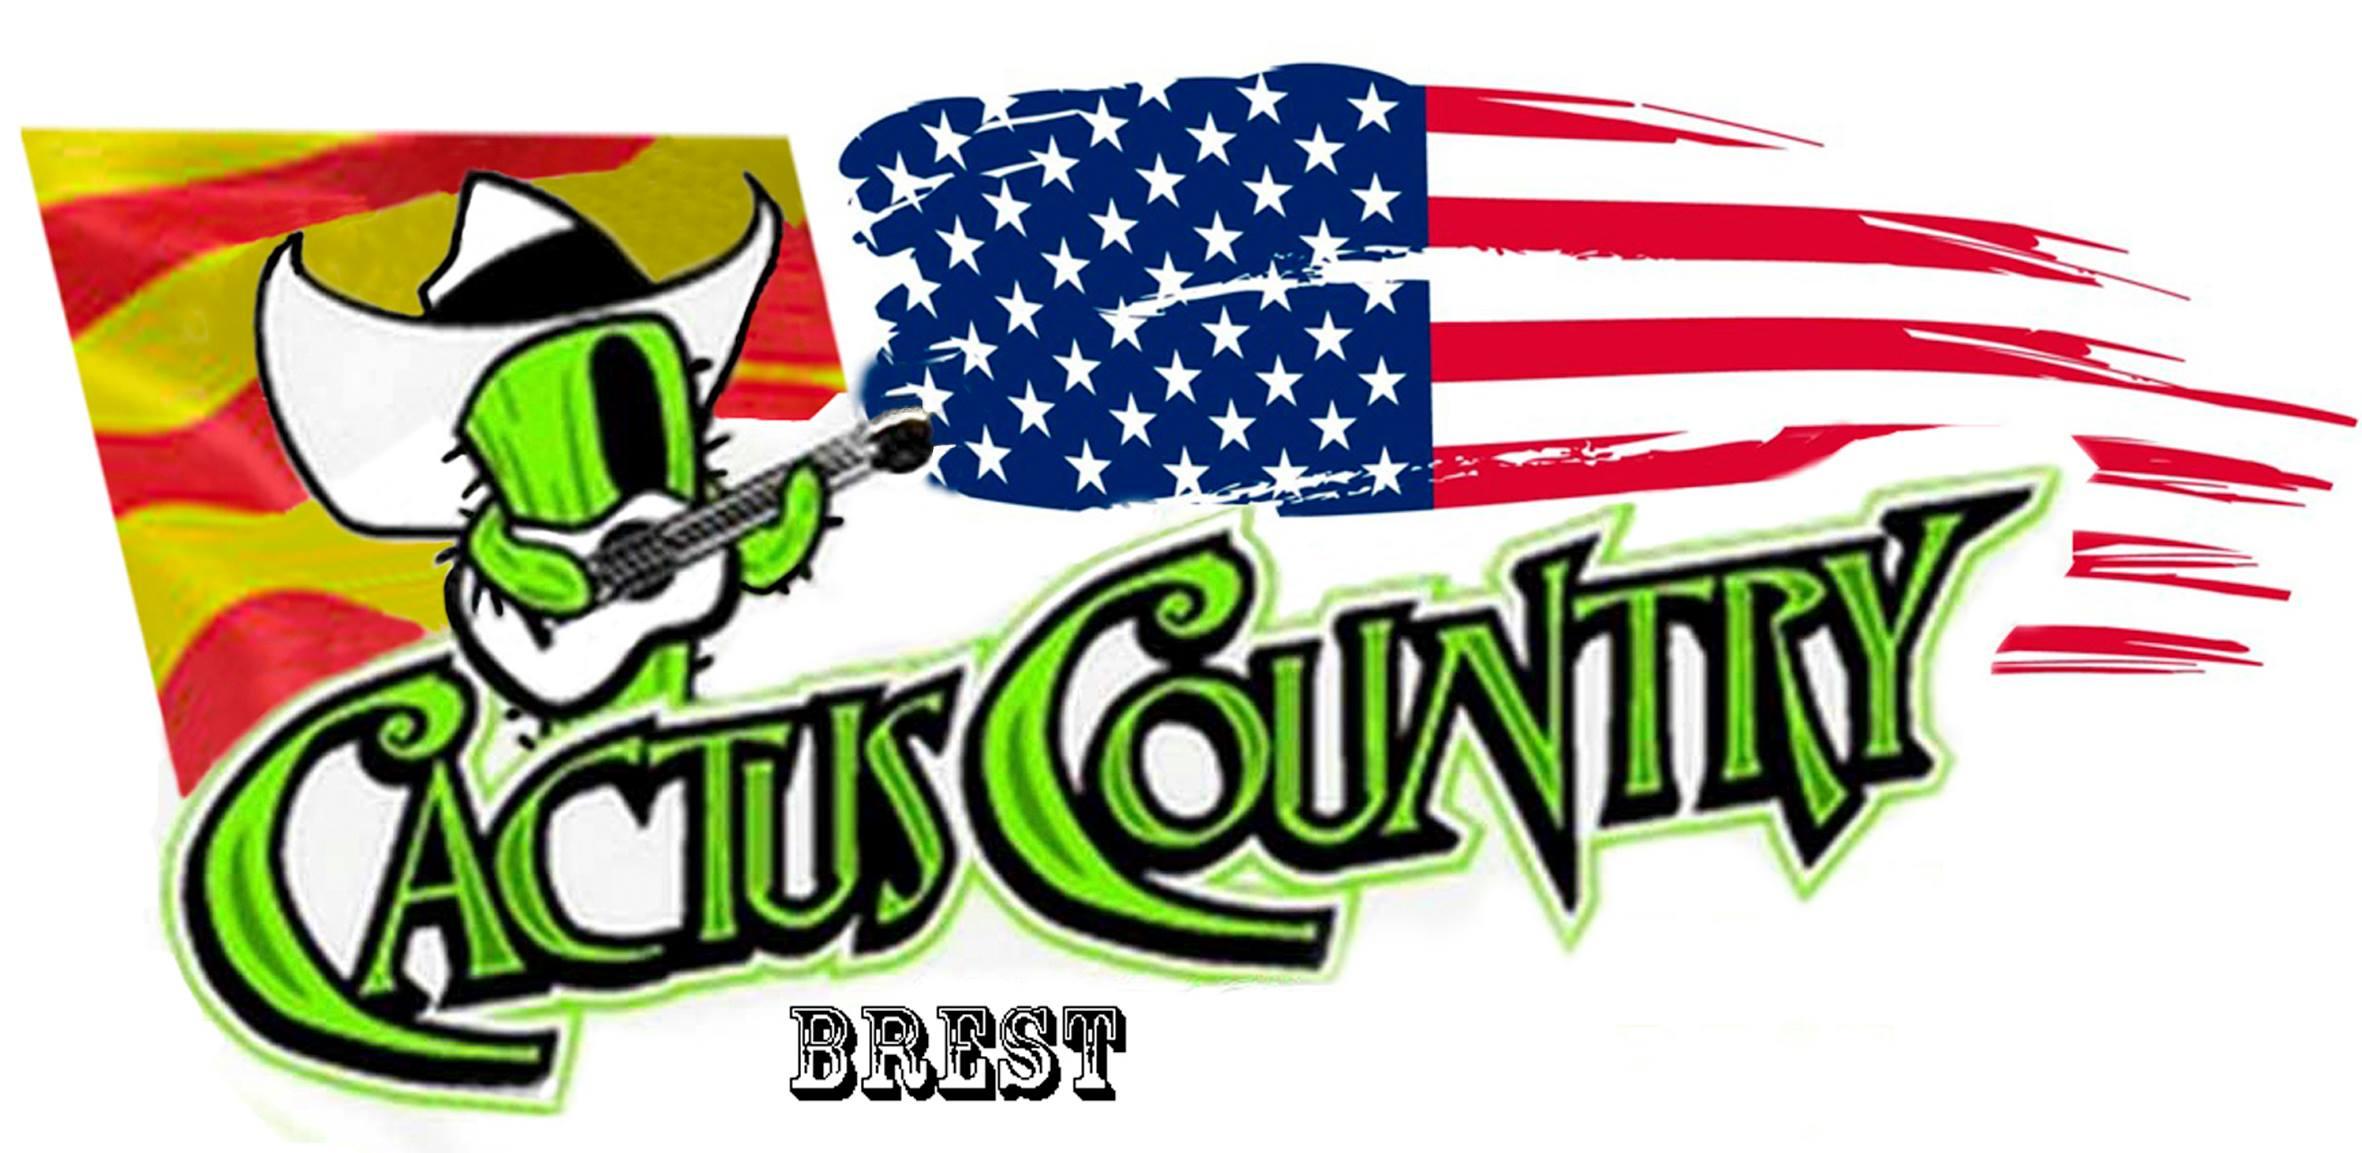 logo cactus.jpg